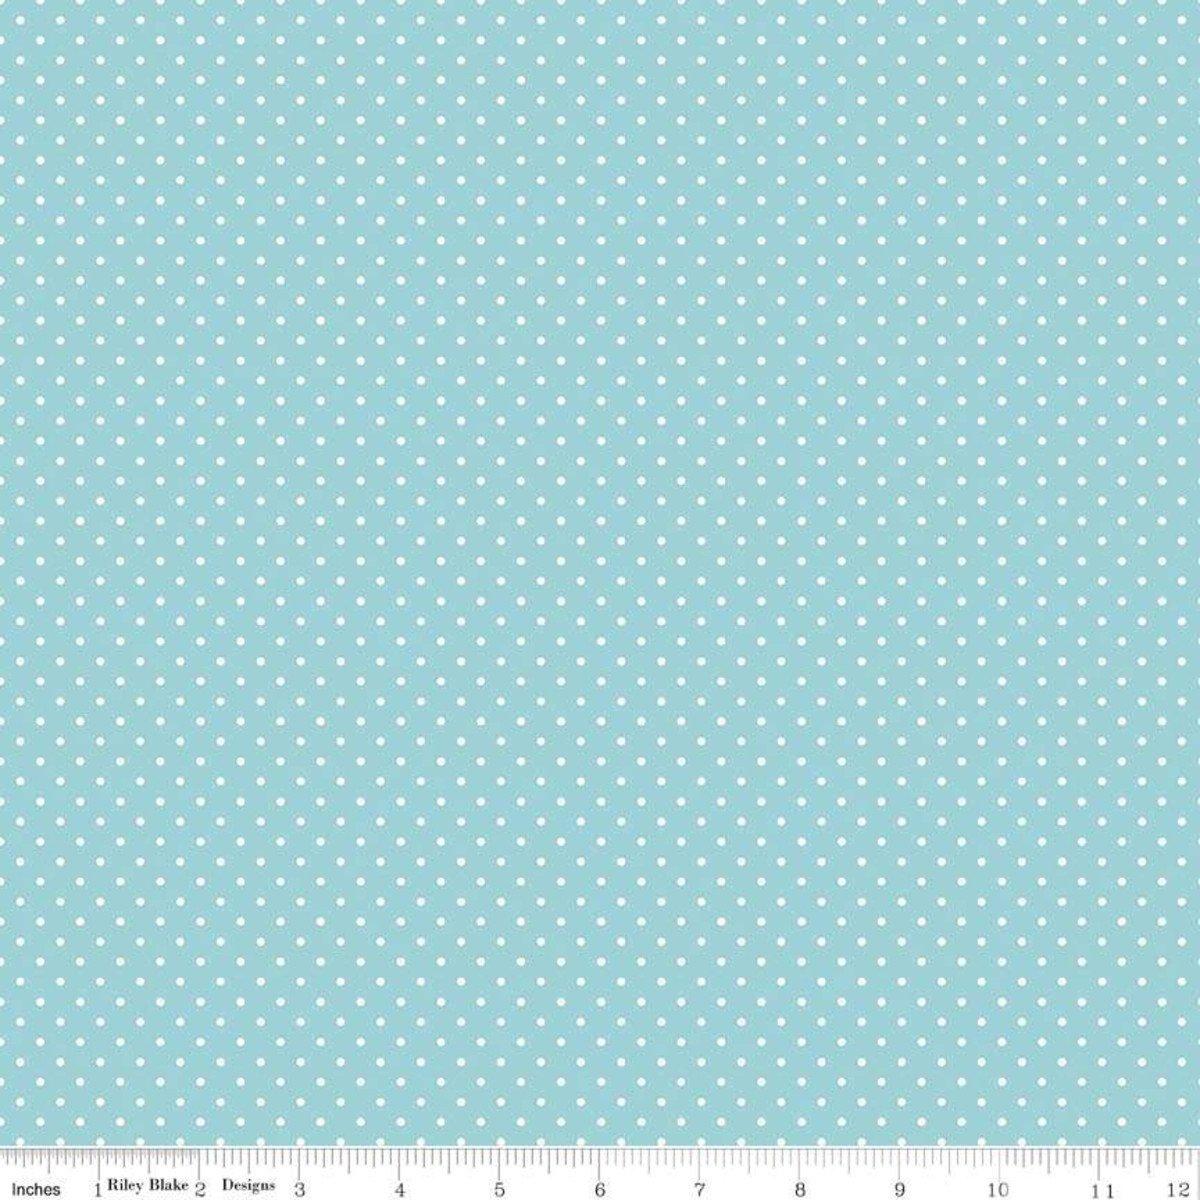 Riley Blake Designs, Swiss Dot - Swiss Dot Aqua